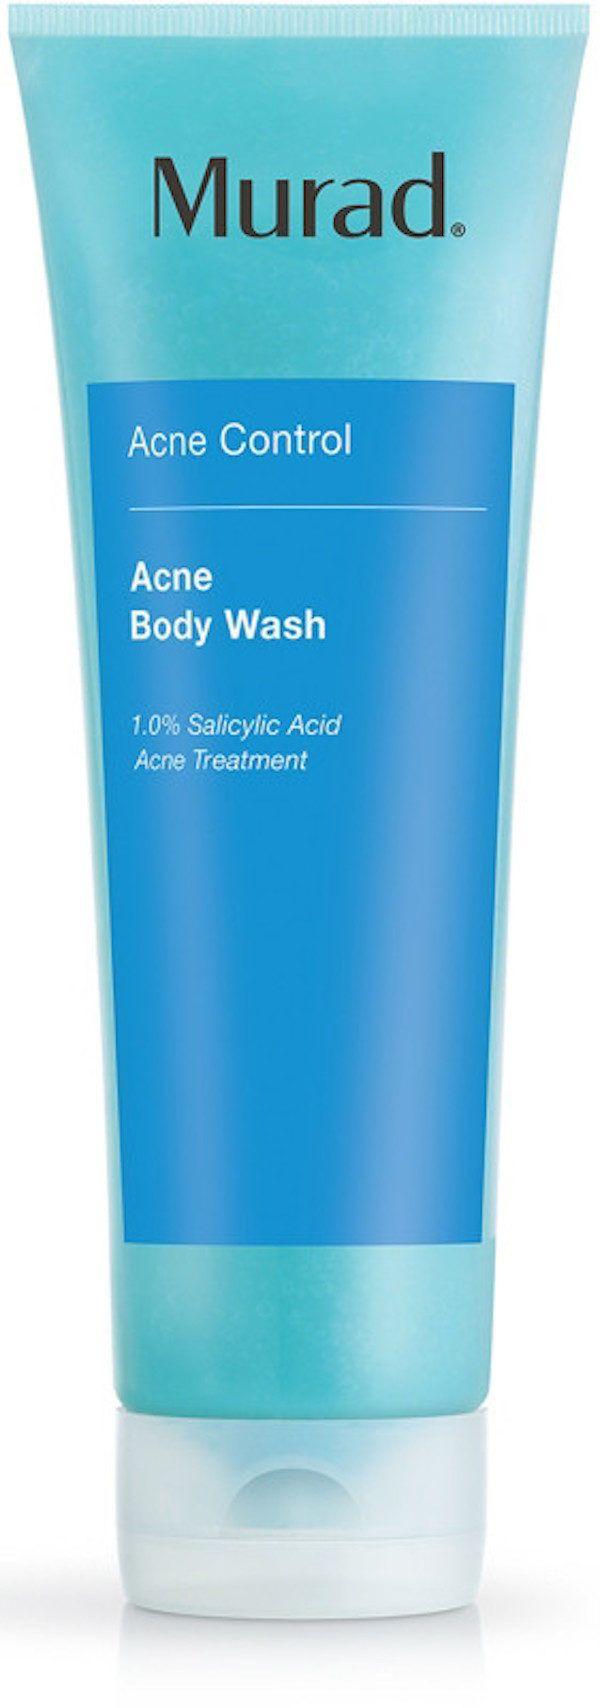 Murad Acne Body Wash,